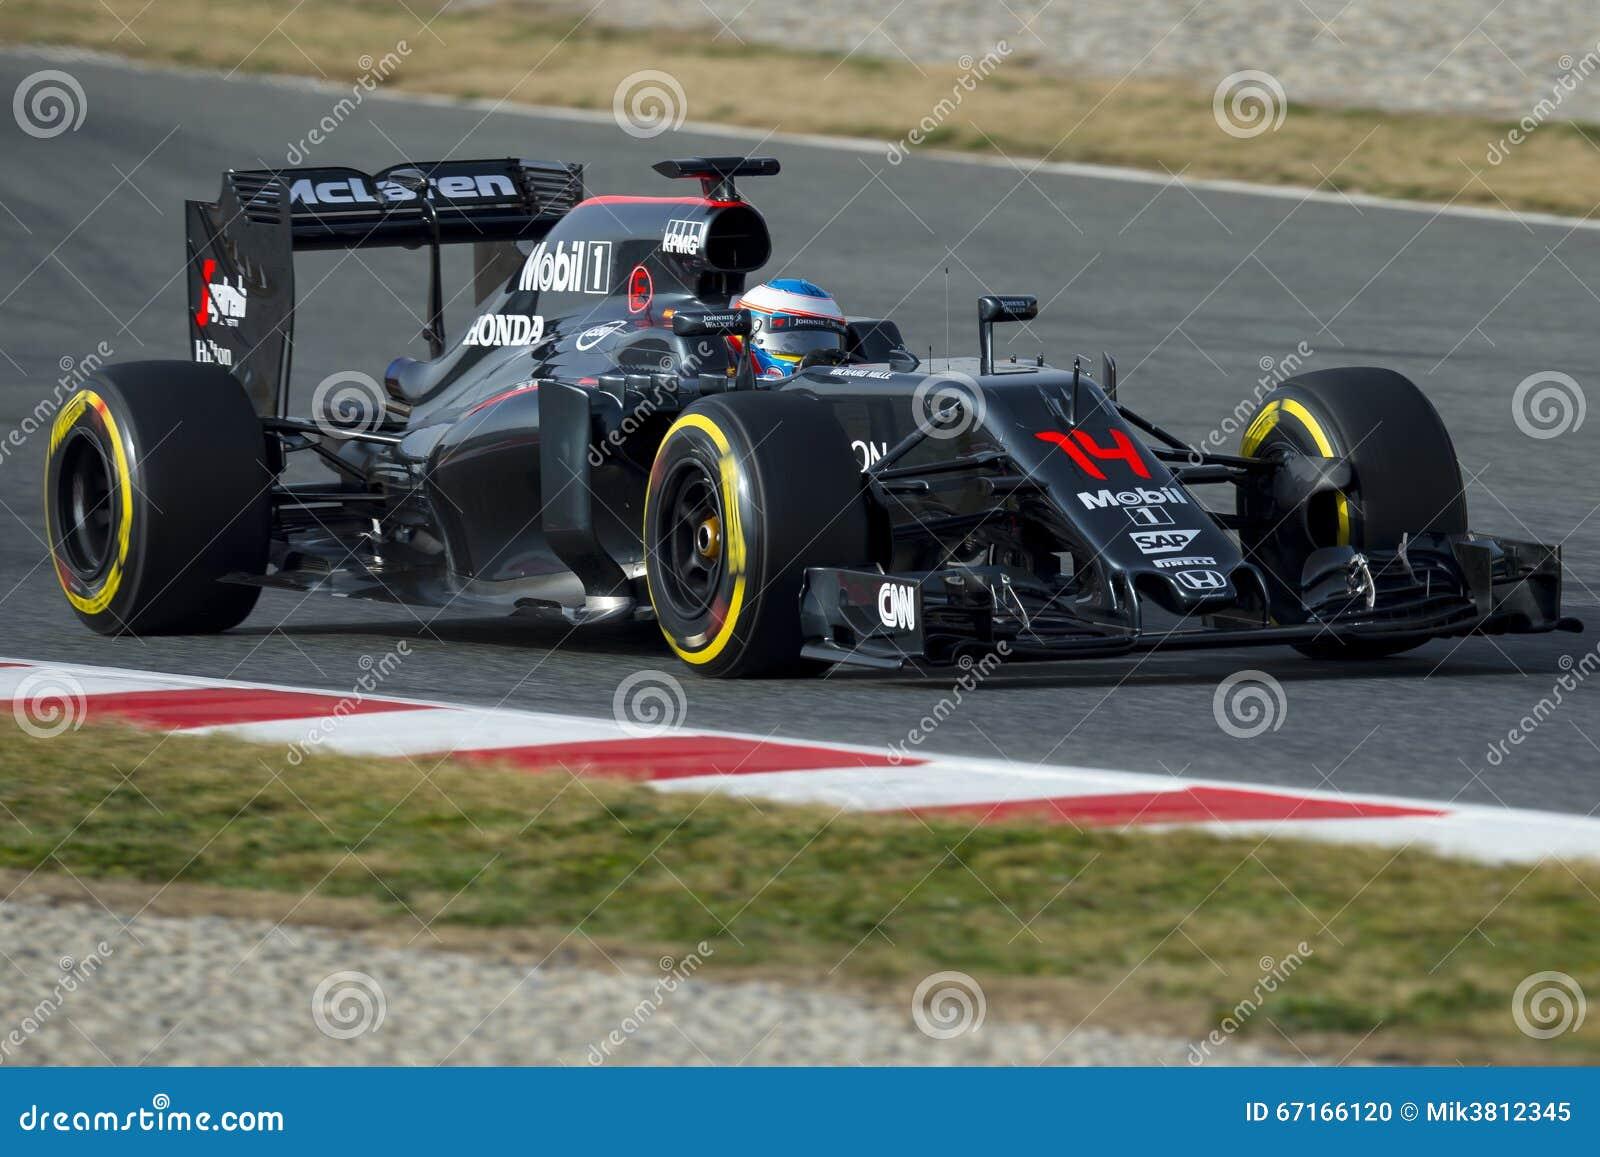 Circuito Fernando Alonso : Conductor fernando alonso personas mclaren imagen editorial imagen